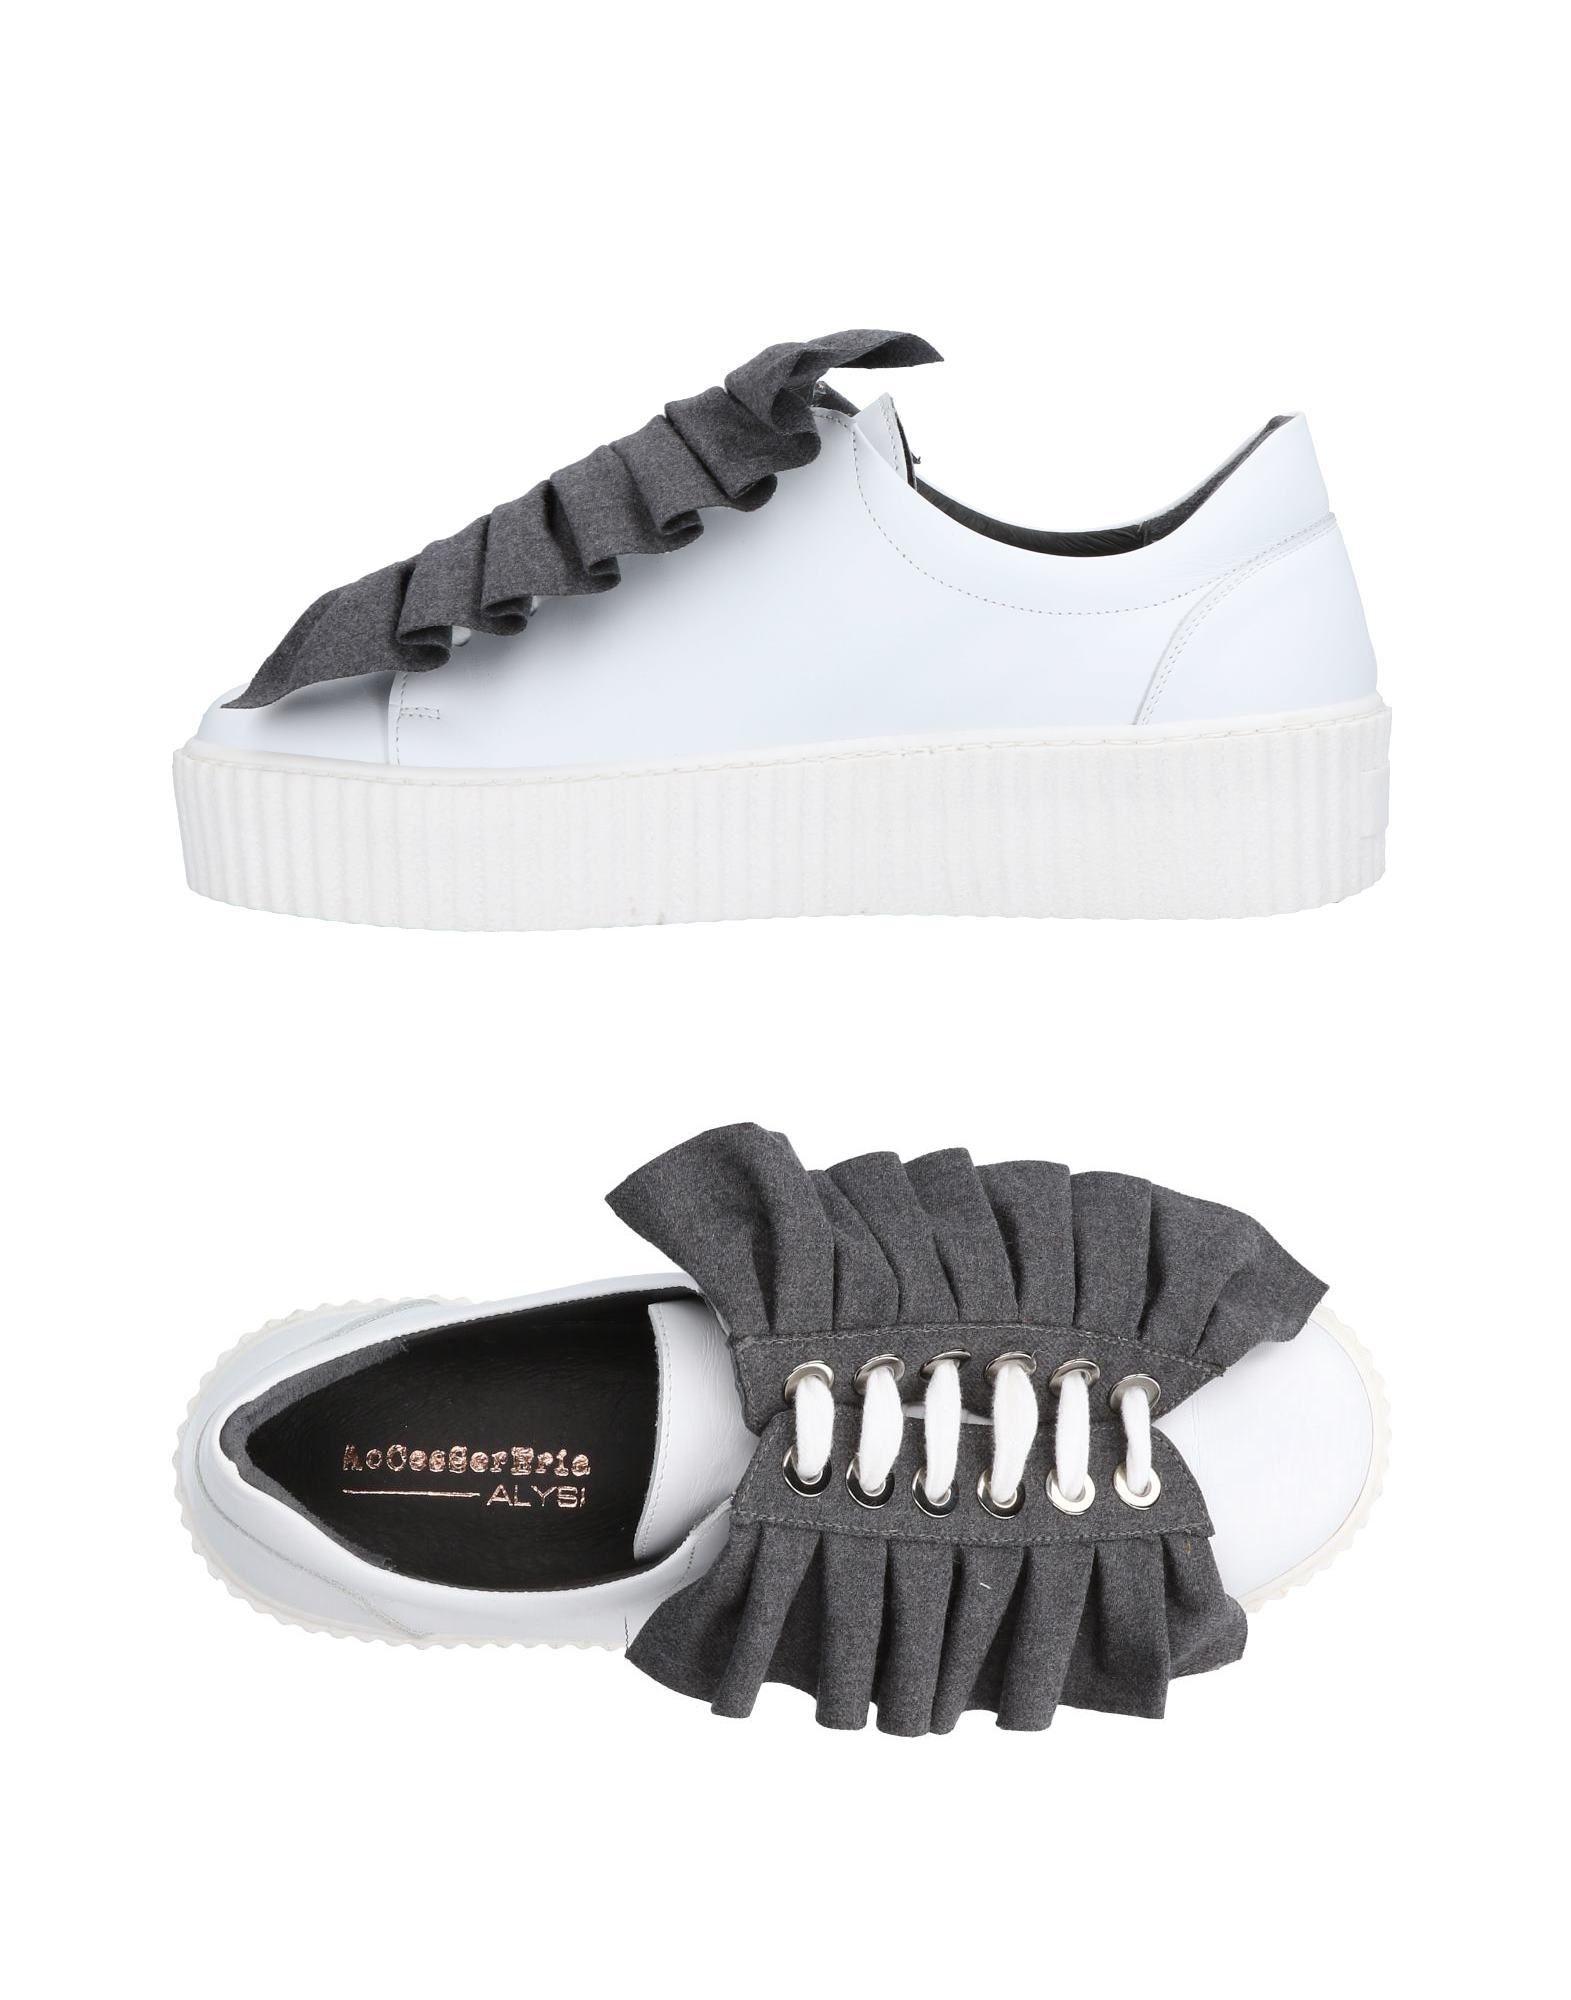 Moda Sneakers Alysi Donna - 11469710DR